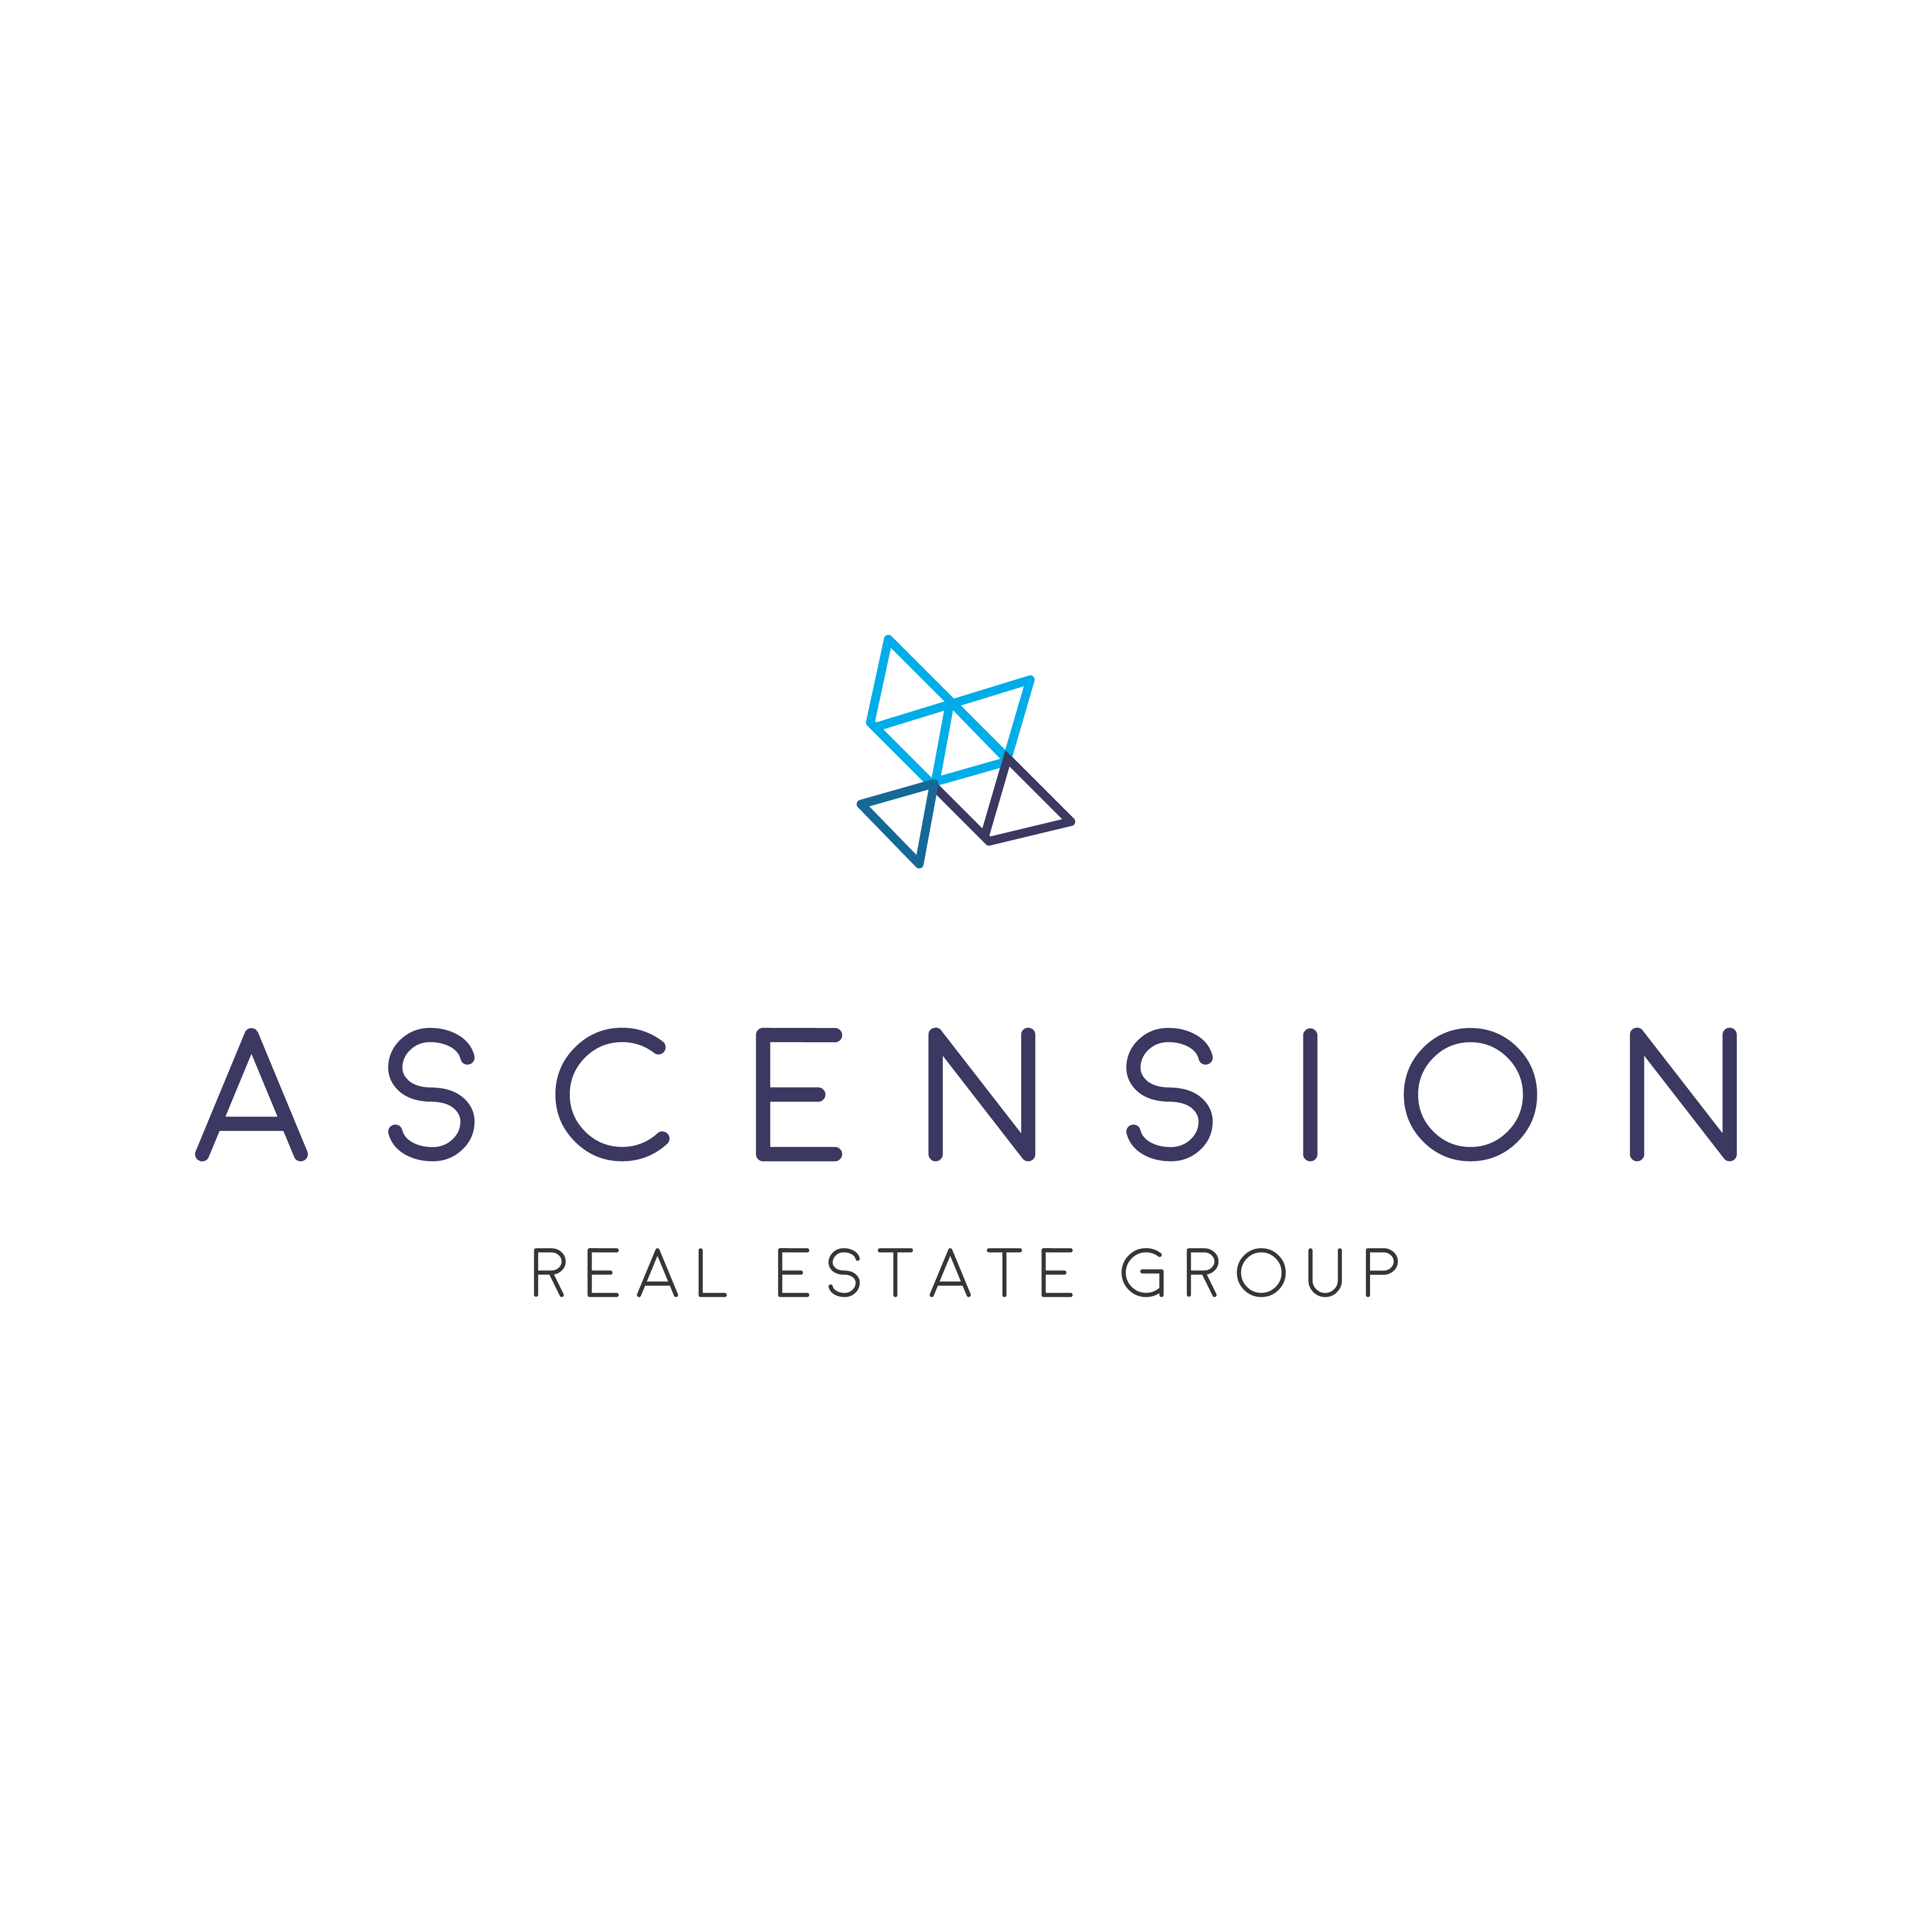 Ascension Real Estate Group